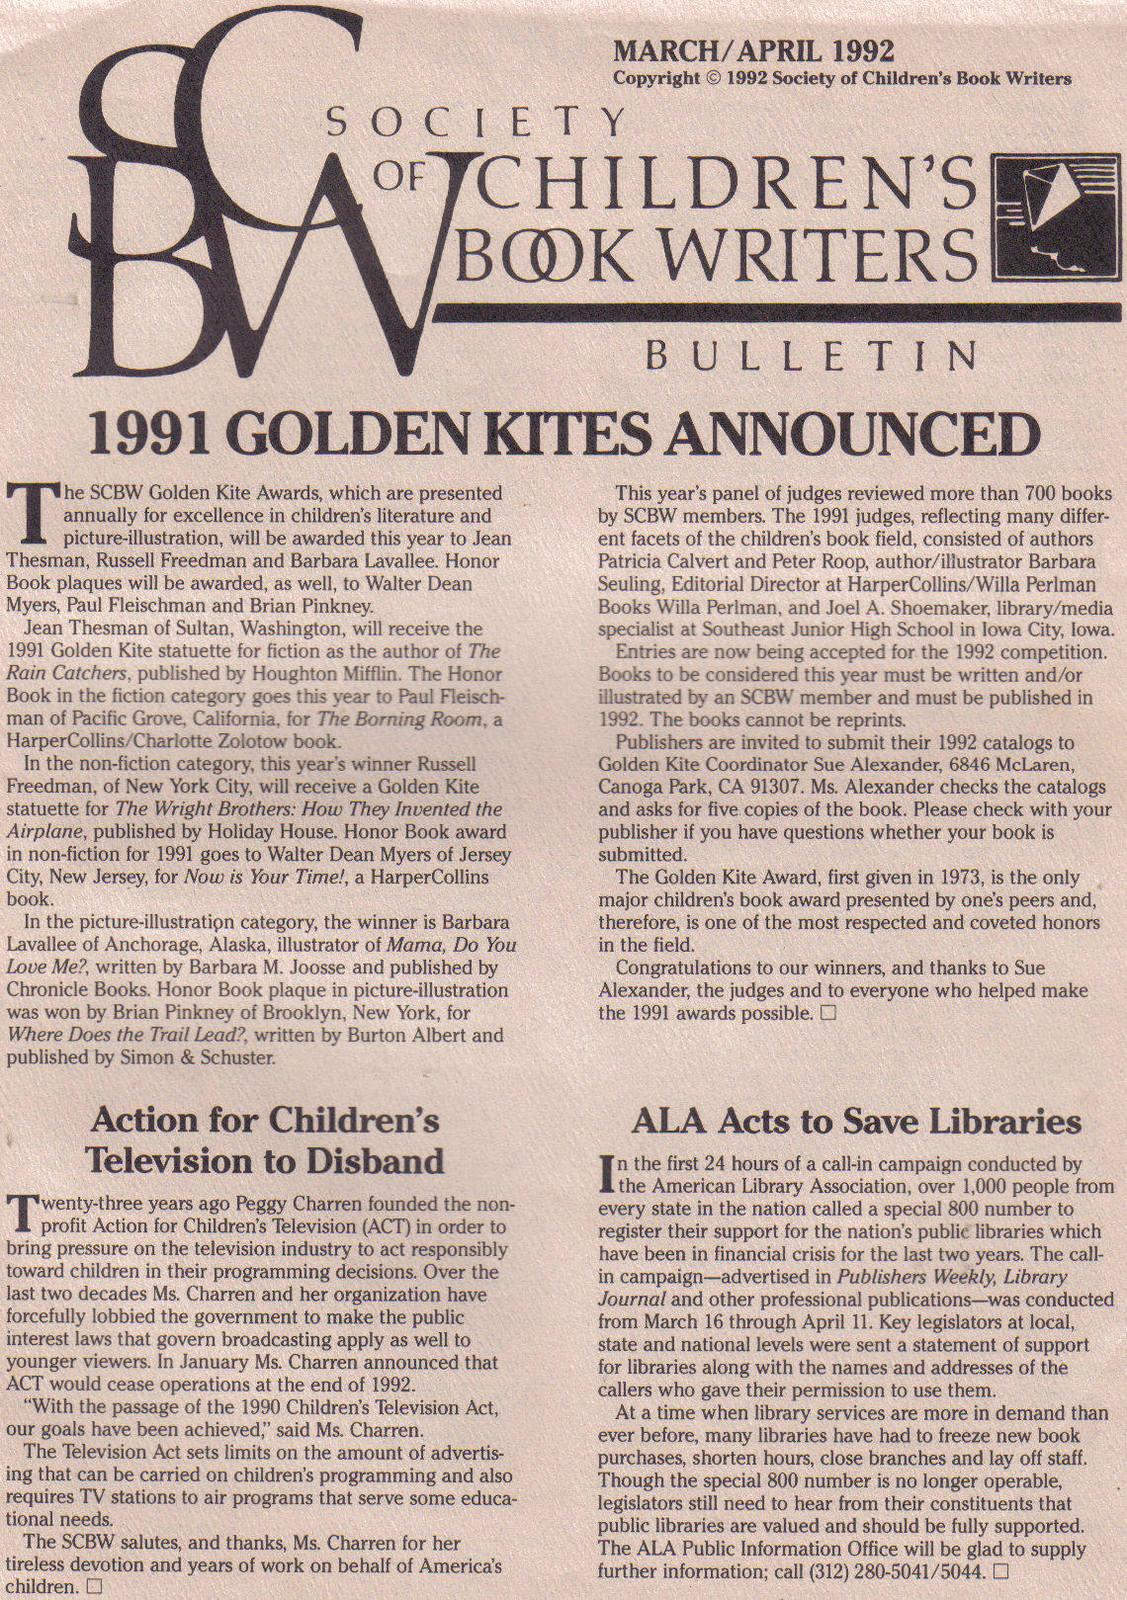 (7) SOCIETY OF CHILDREN'S BOOK WRITERS & ILLUSTRATORS image 11